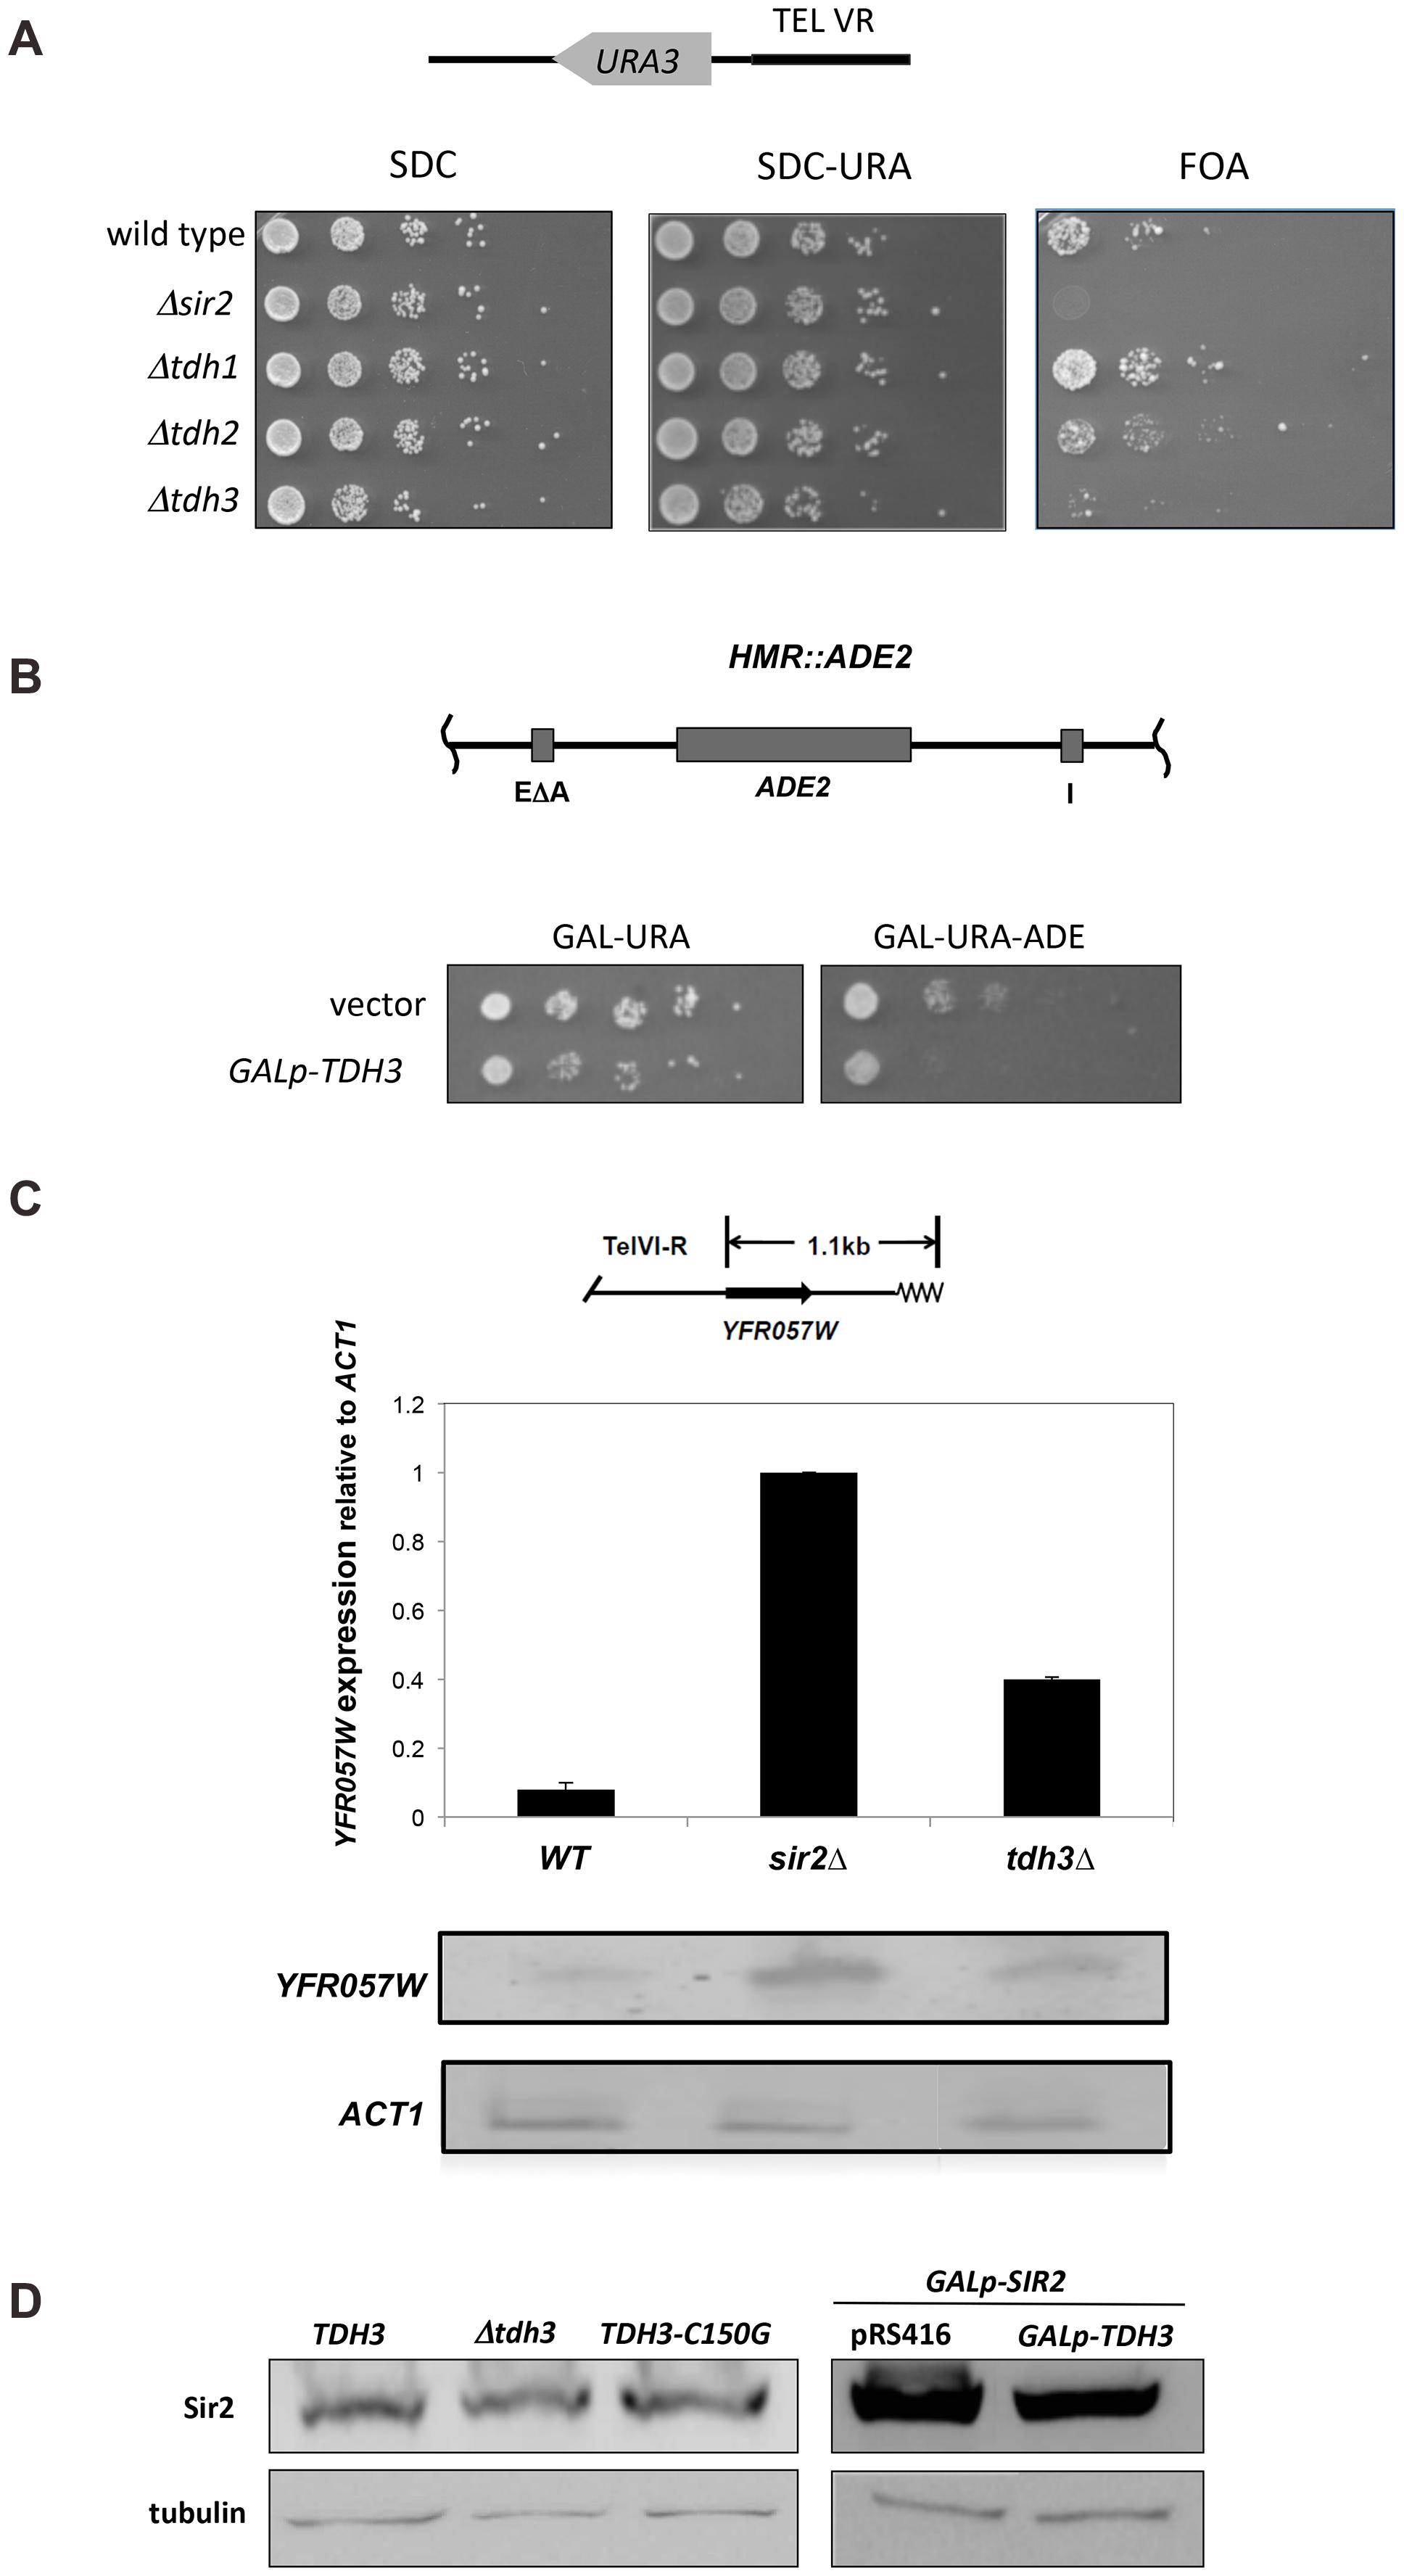 Tdh3 is a novel regulator of Sir2 dependent transcriptional silencing.